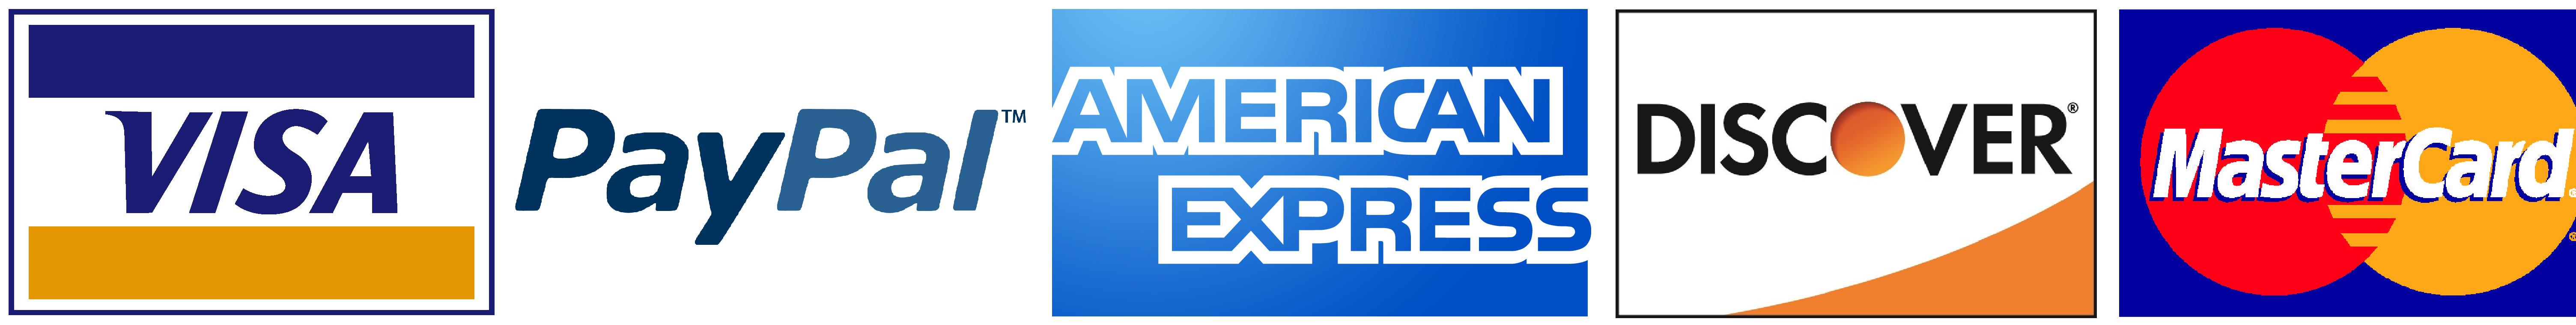 snuggwugg-credit-card-logos-pngtop-vpn-expresspn-review-vpn-vpn-anonymity-vpn-express-evt4tu48.png